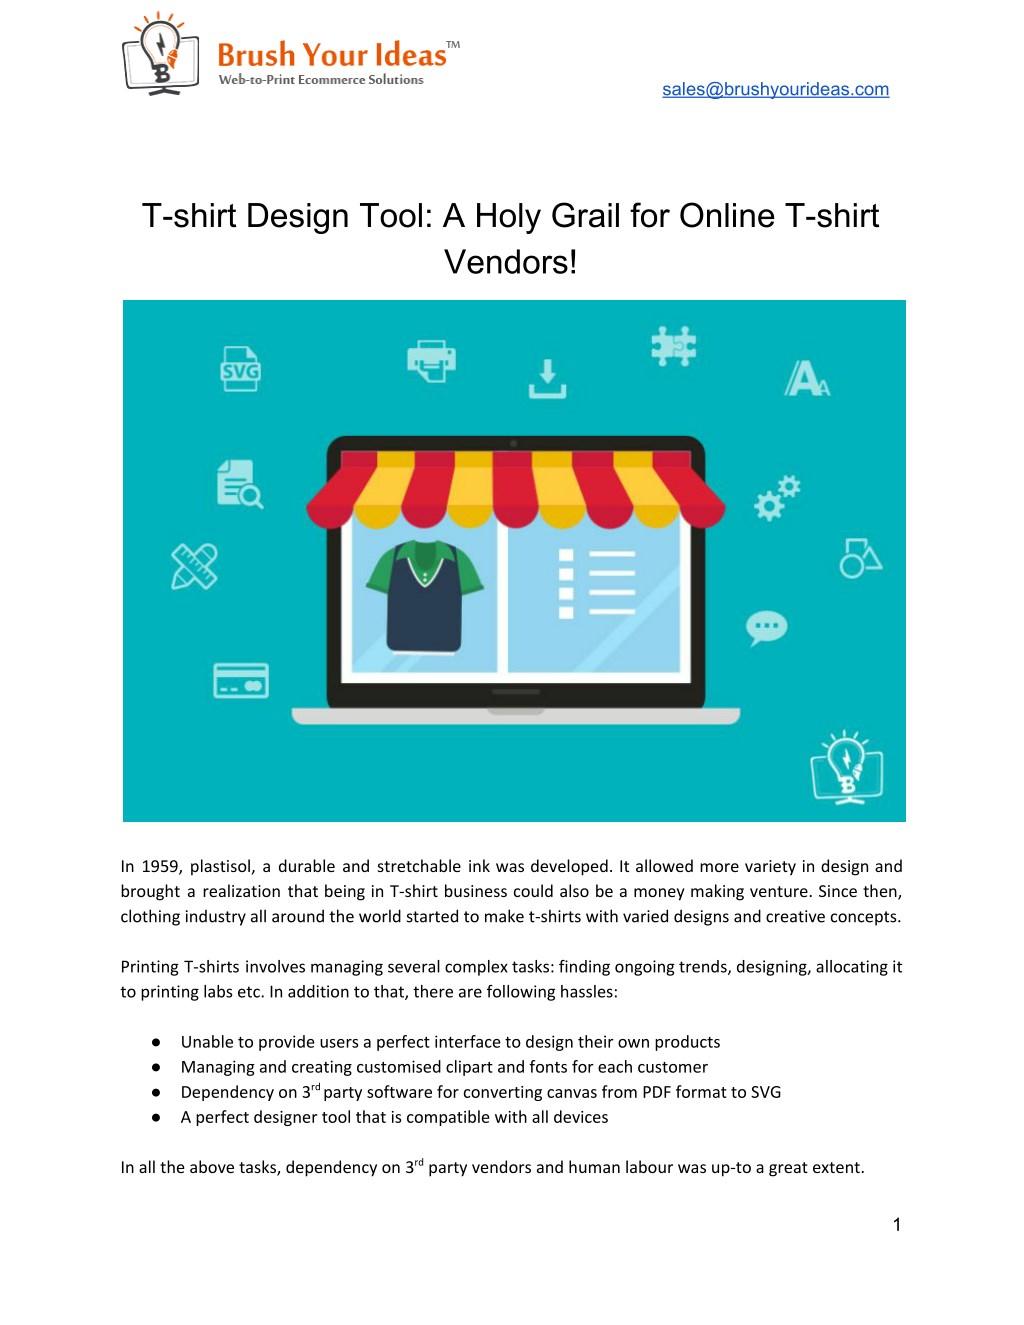 Ppt T Shirt Design Tool A Holy Grail For Online T Shirt Vendors